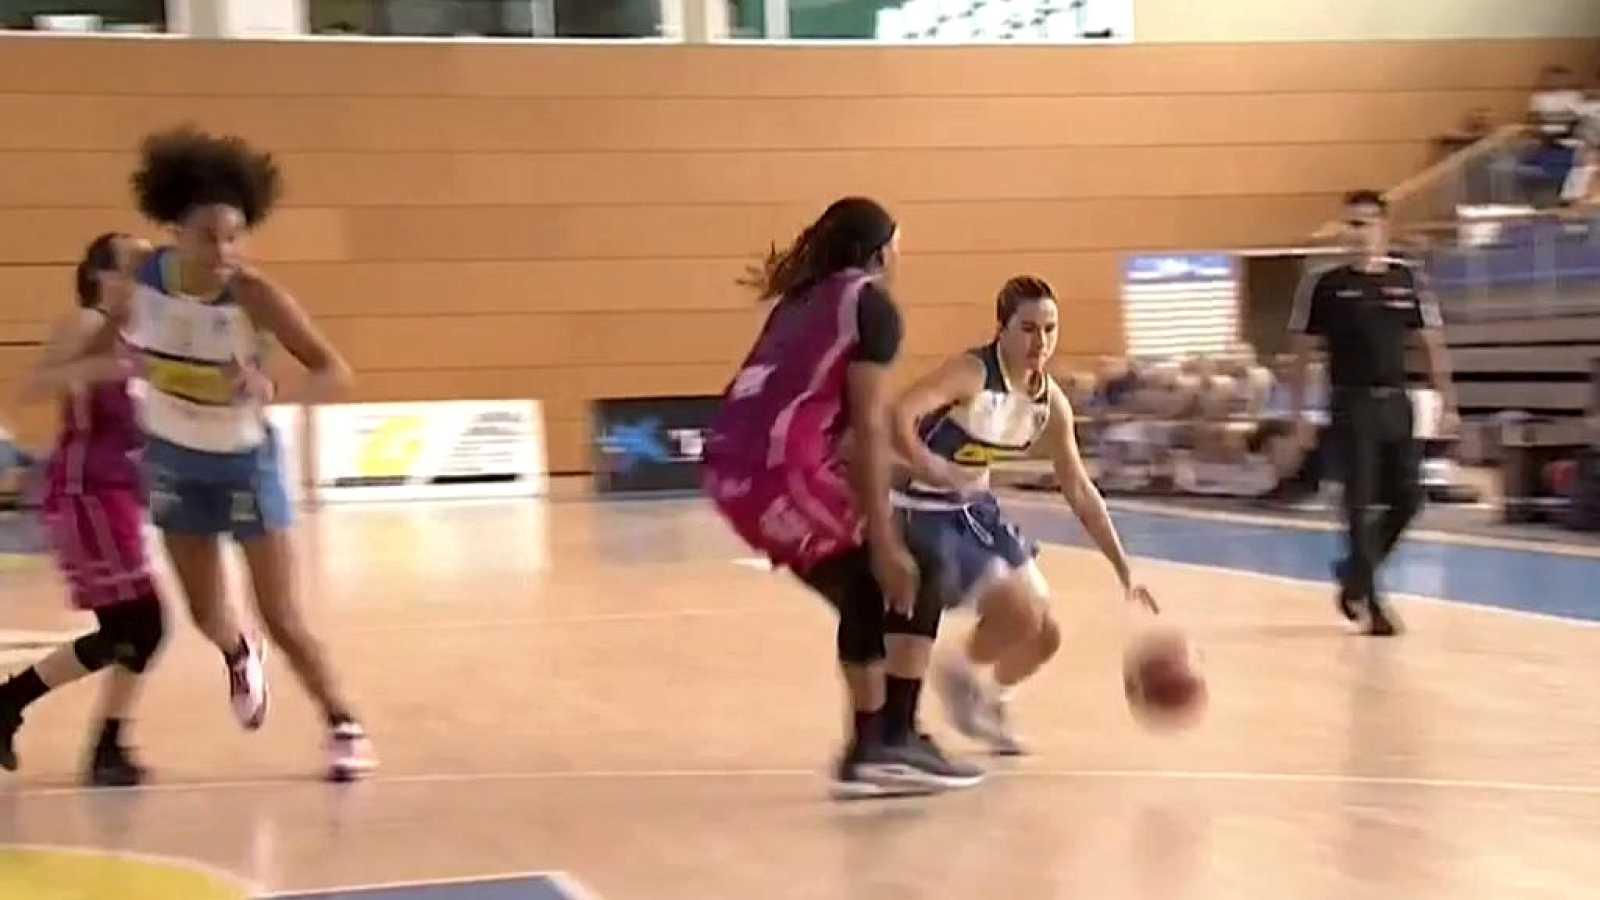 Baloncesto - Liga Femenina 2ª jornada: Cadí La Seu-RPK Araski - ver ahora